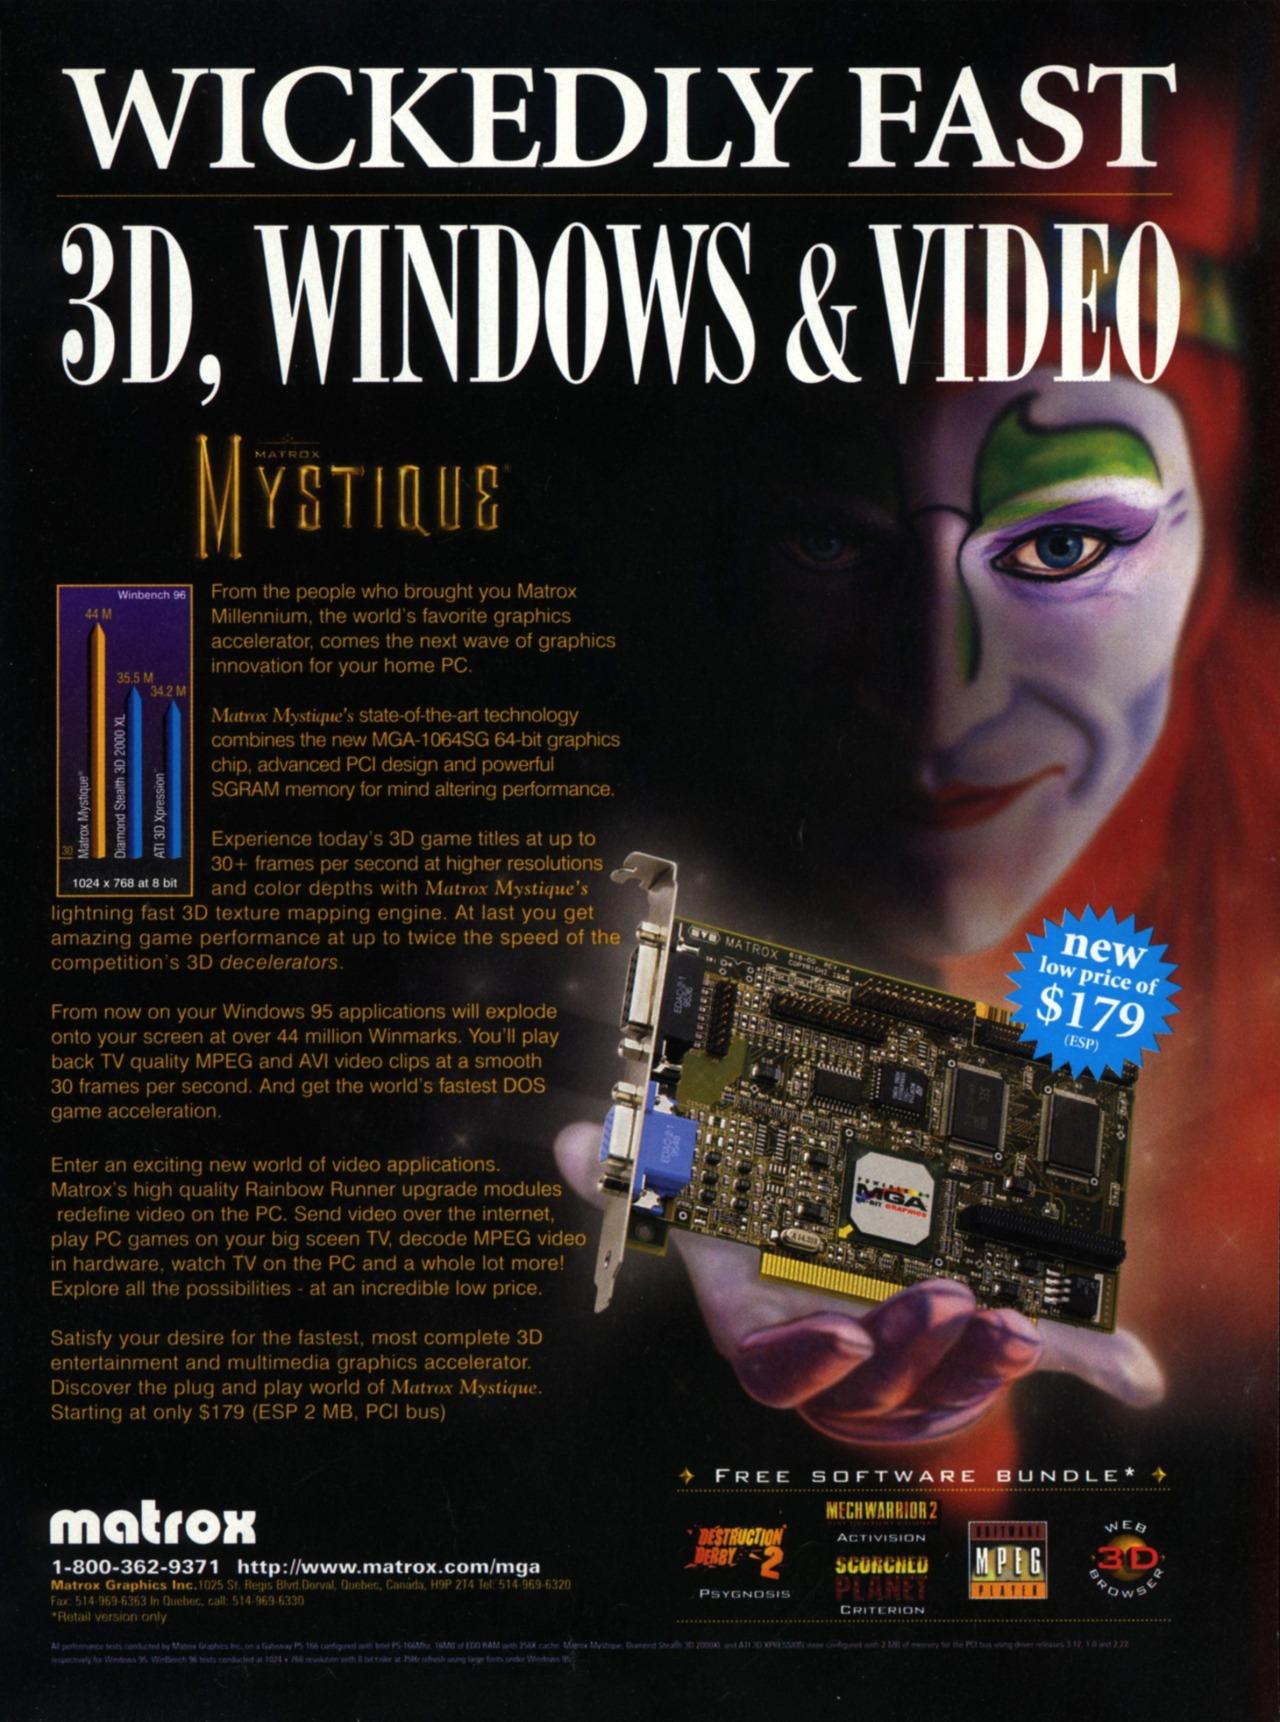 MatroxMystiqueAd.jpg